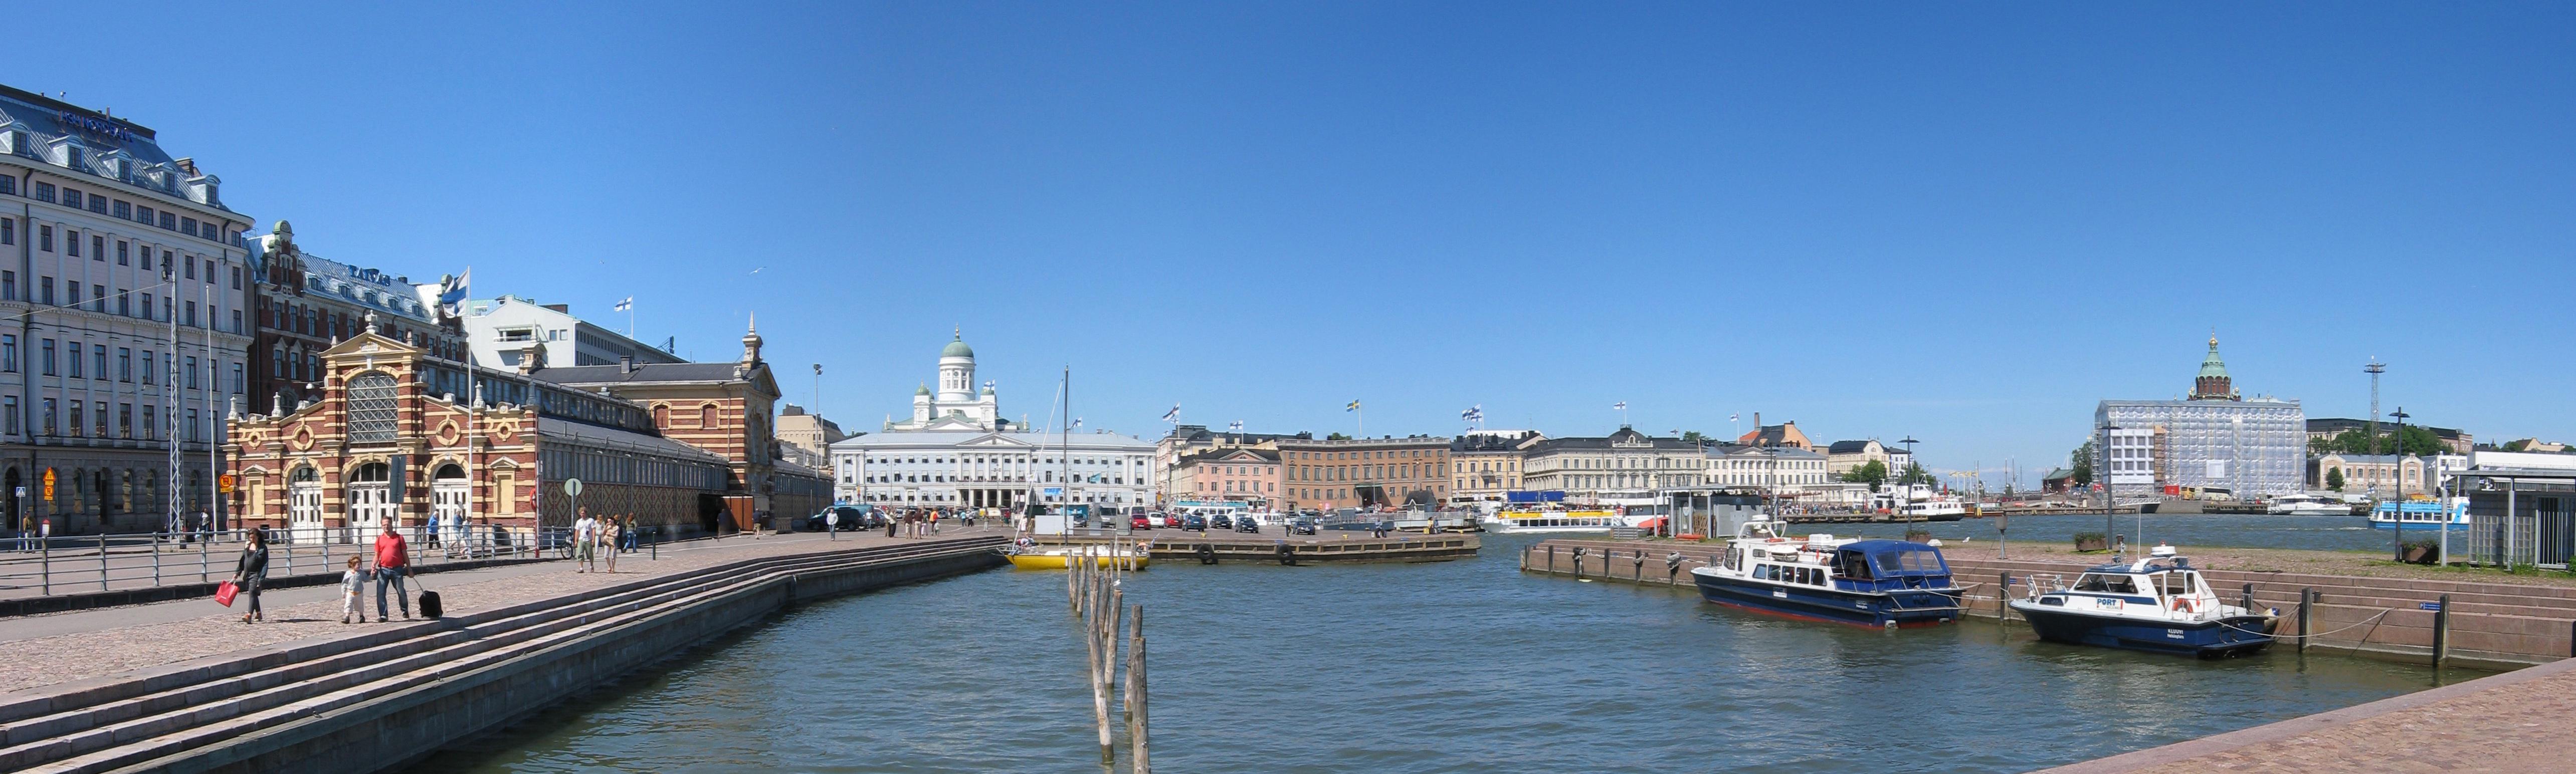 File:Helsinki-hafen-panorama.jpg - Wikimedia Commons